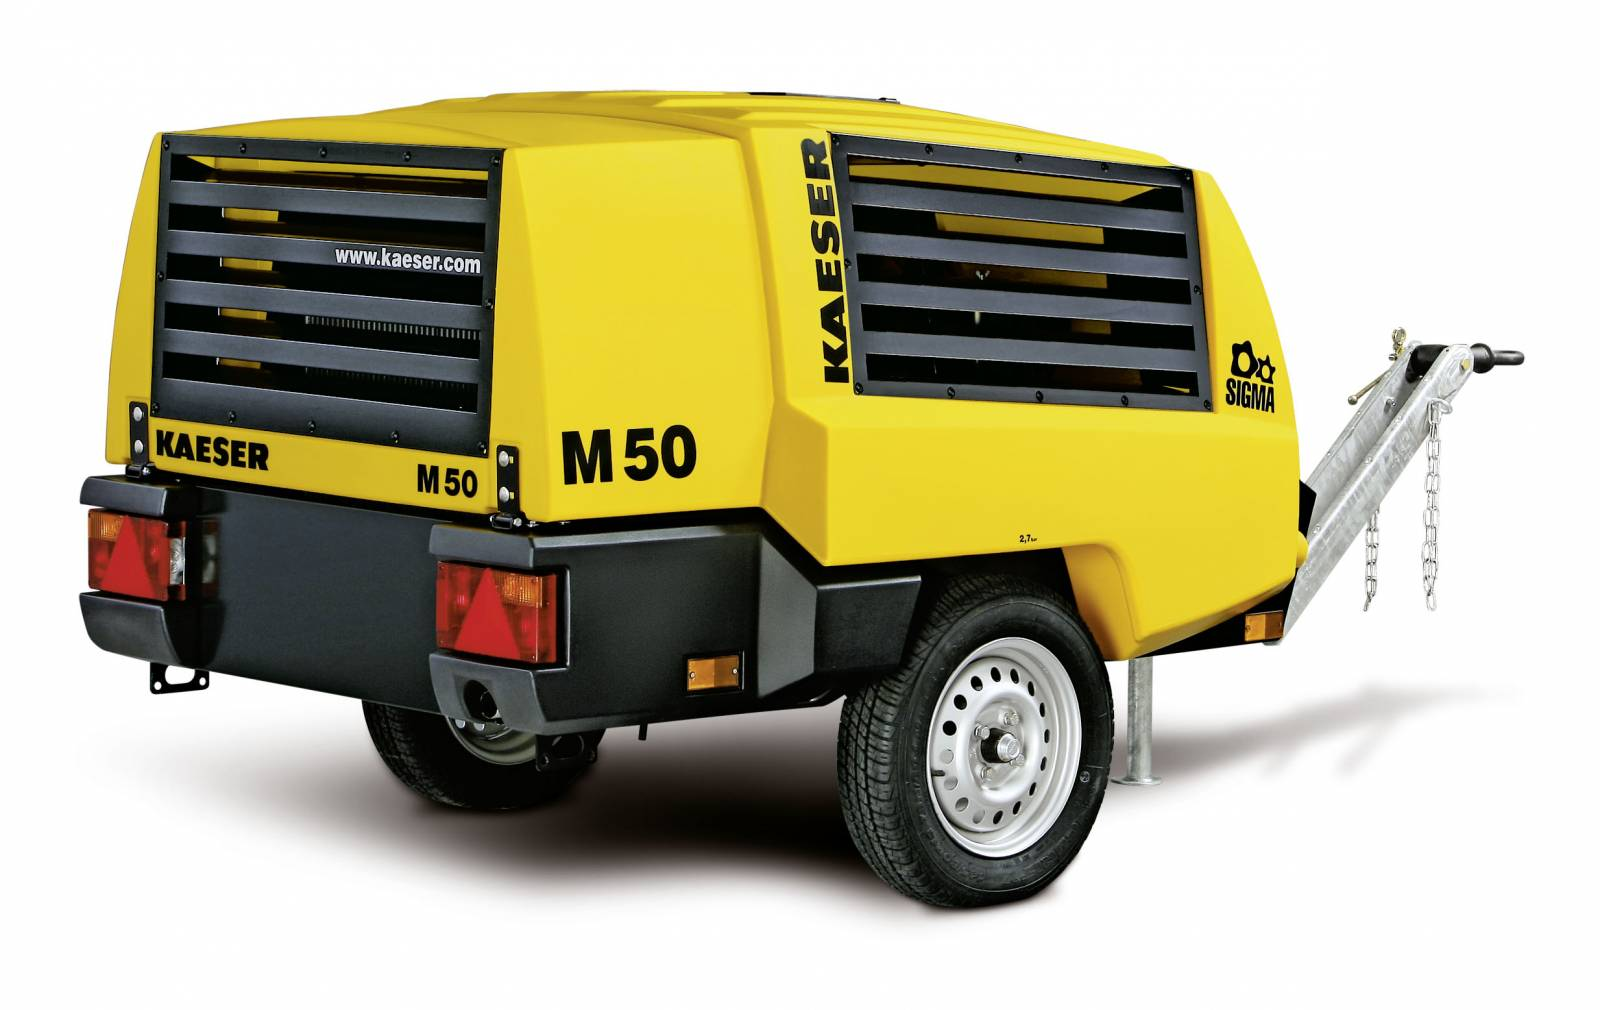 Kompressor KAESER M50